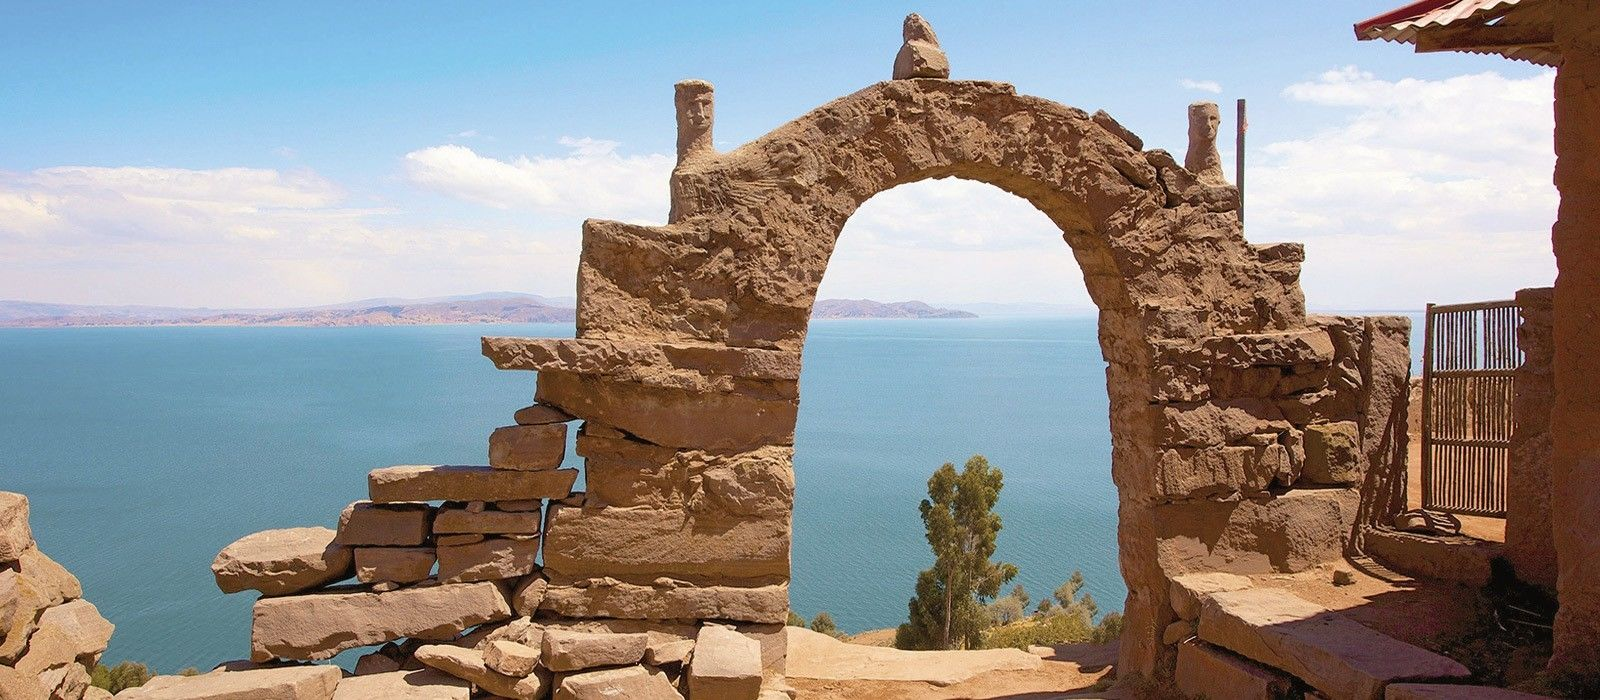 Peru: Highlights of the South Tour Trip 3